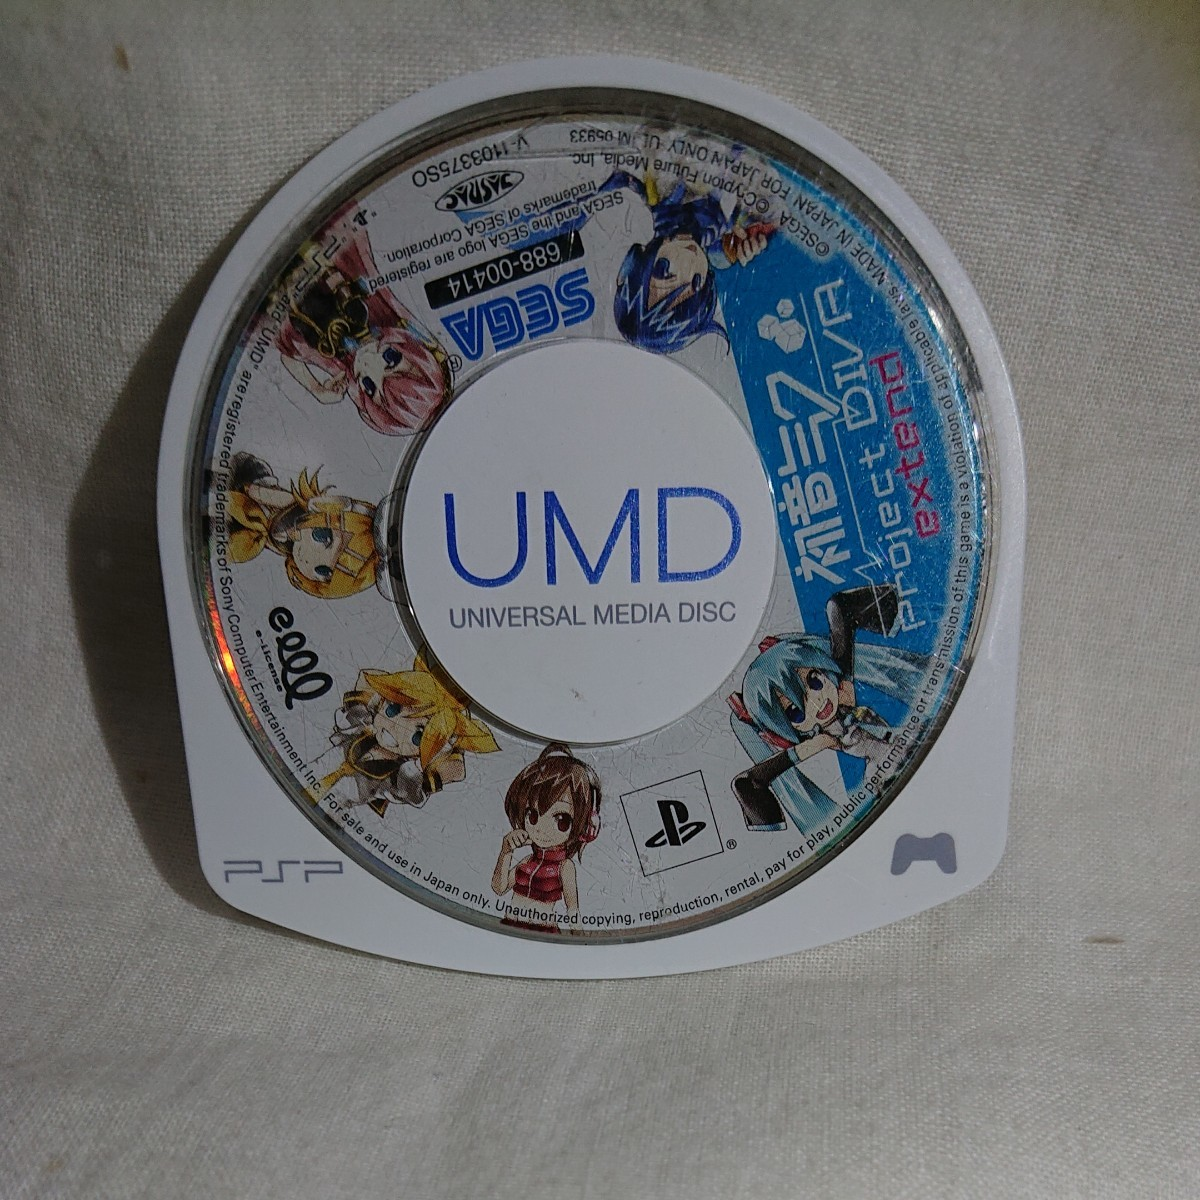 PSP 初音ミク Project diva シリーズセット ソフトのみ 動作確認済み  PSPソフト